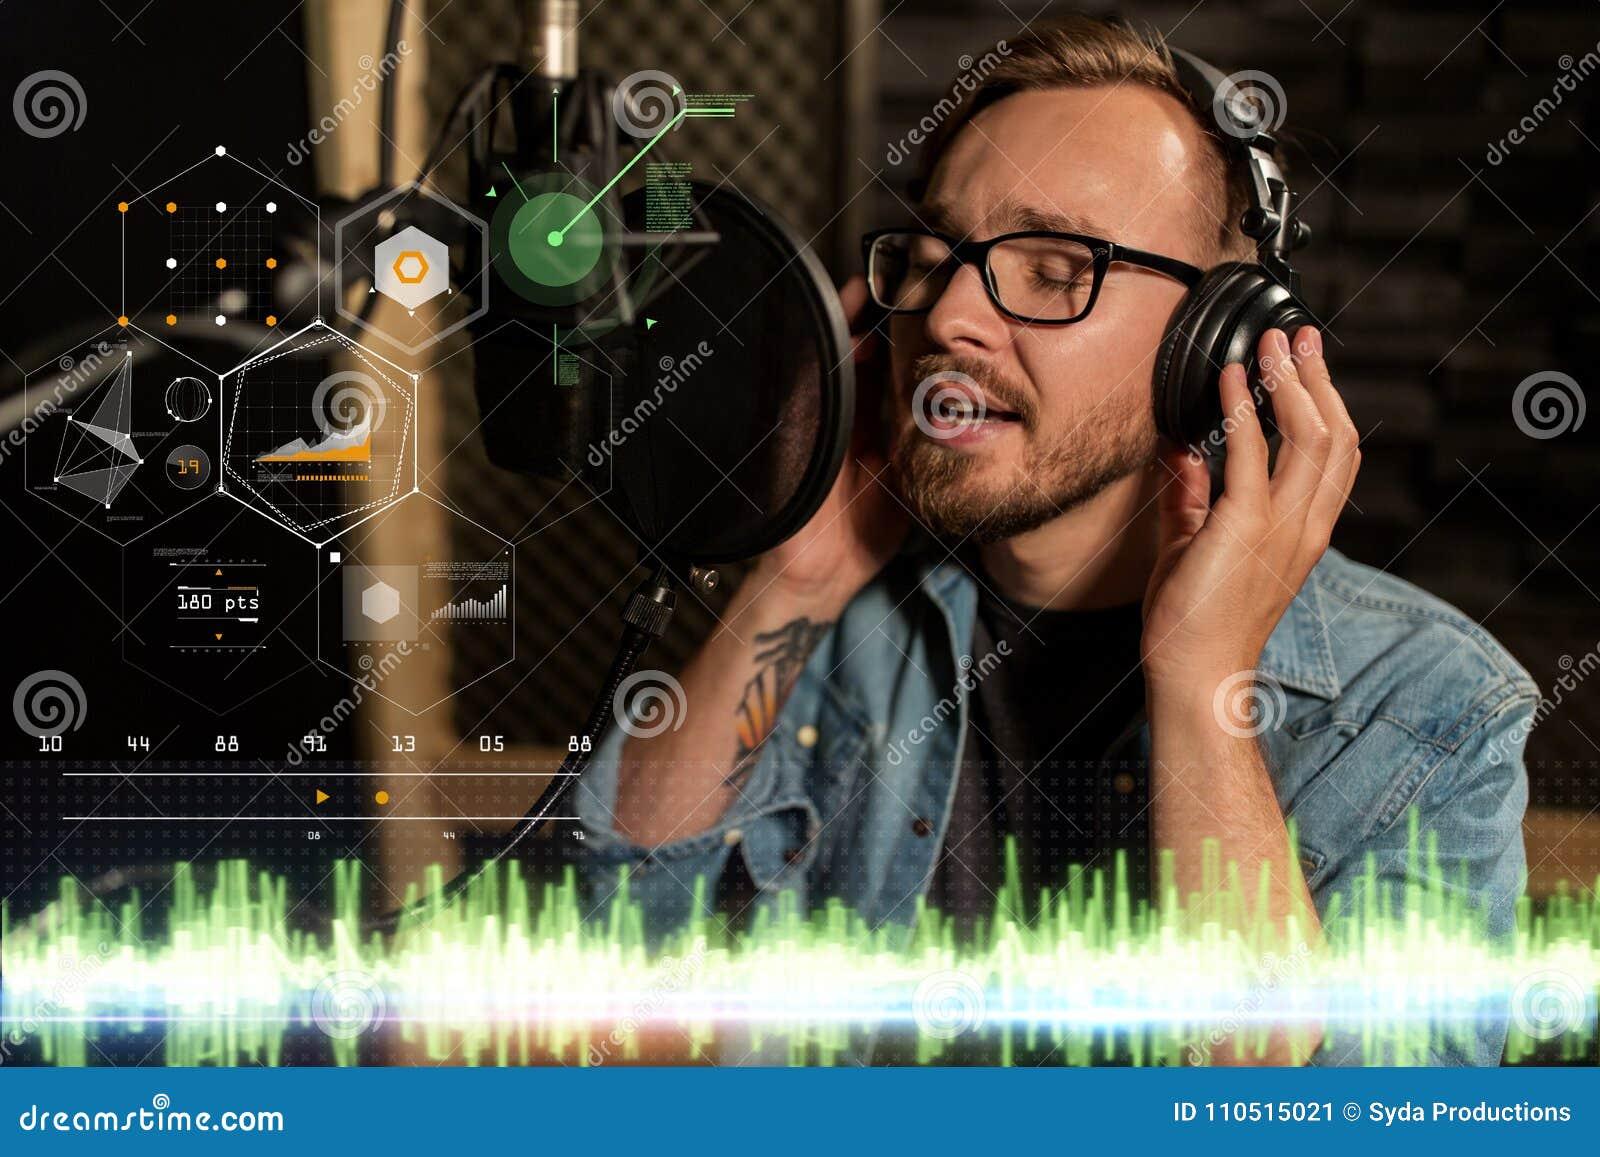 Man With Headphones Singing At Recording Studio Stock Image